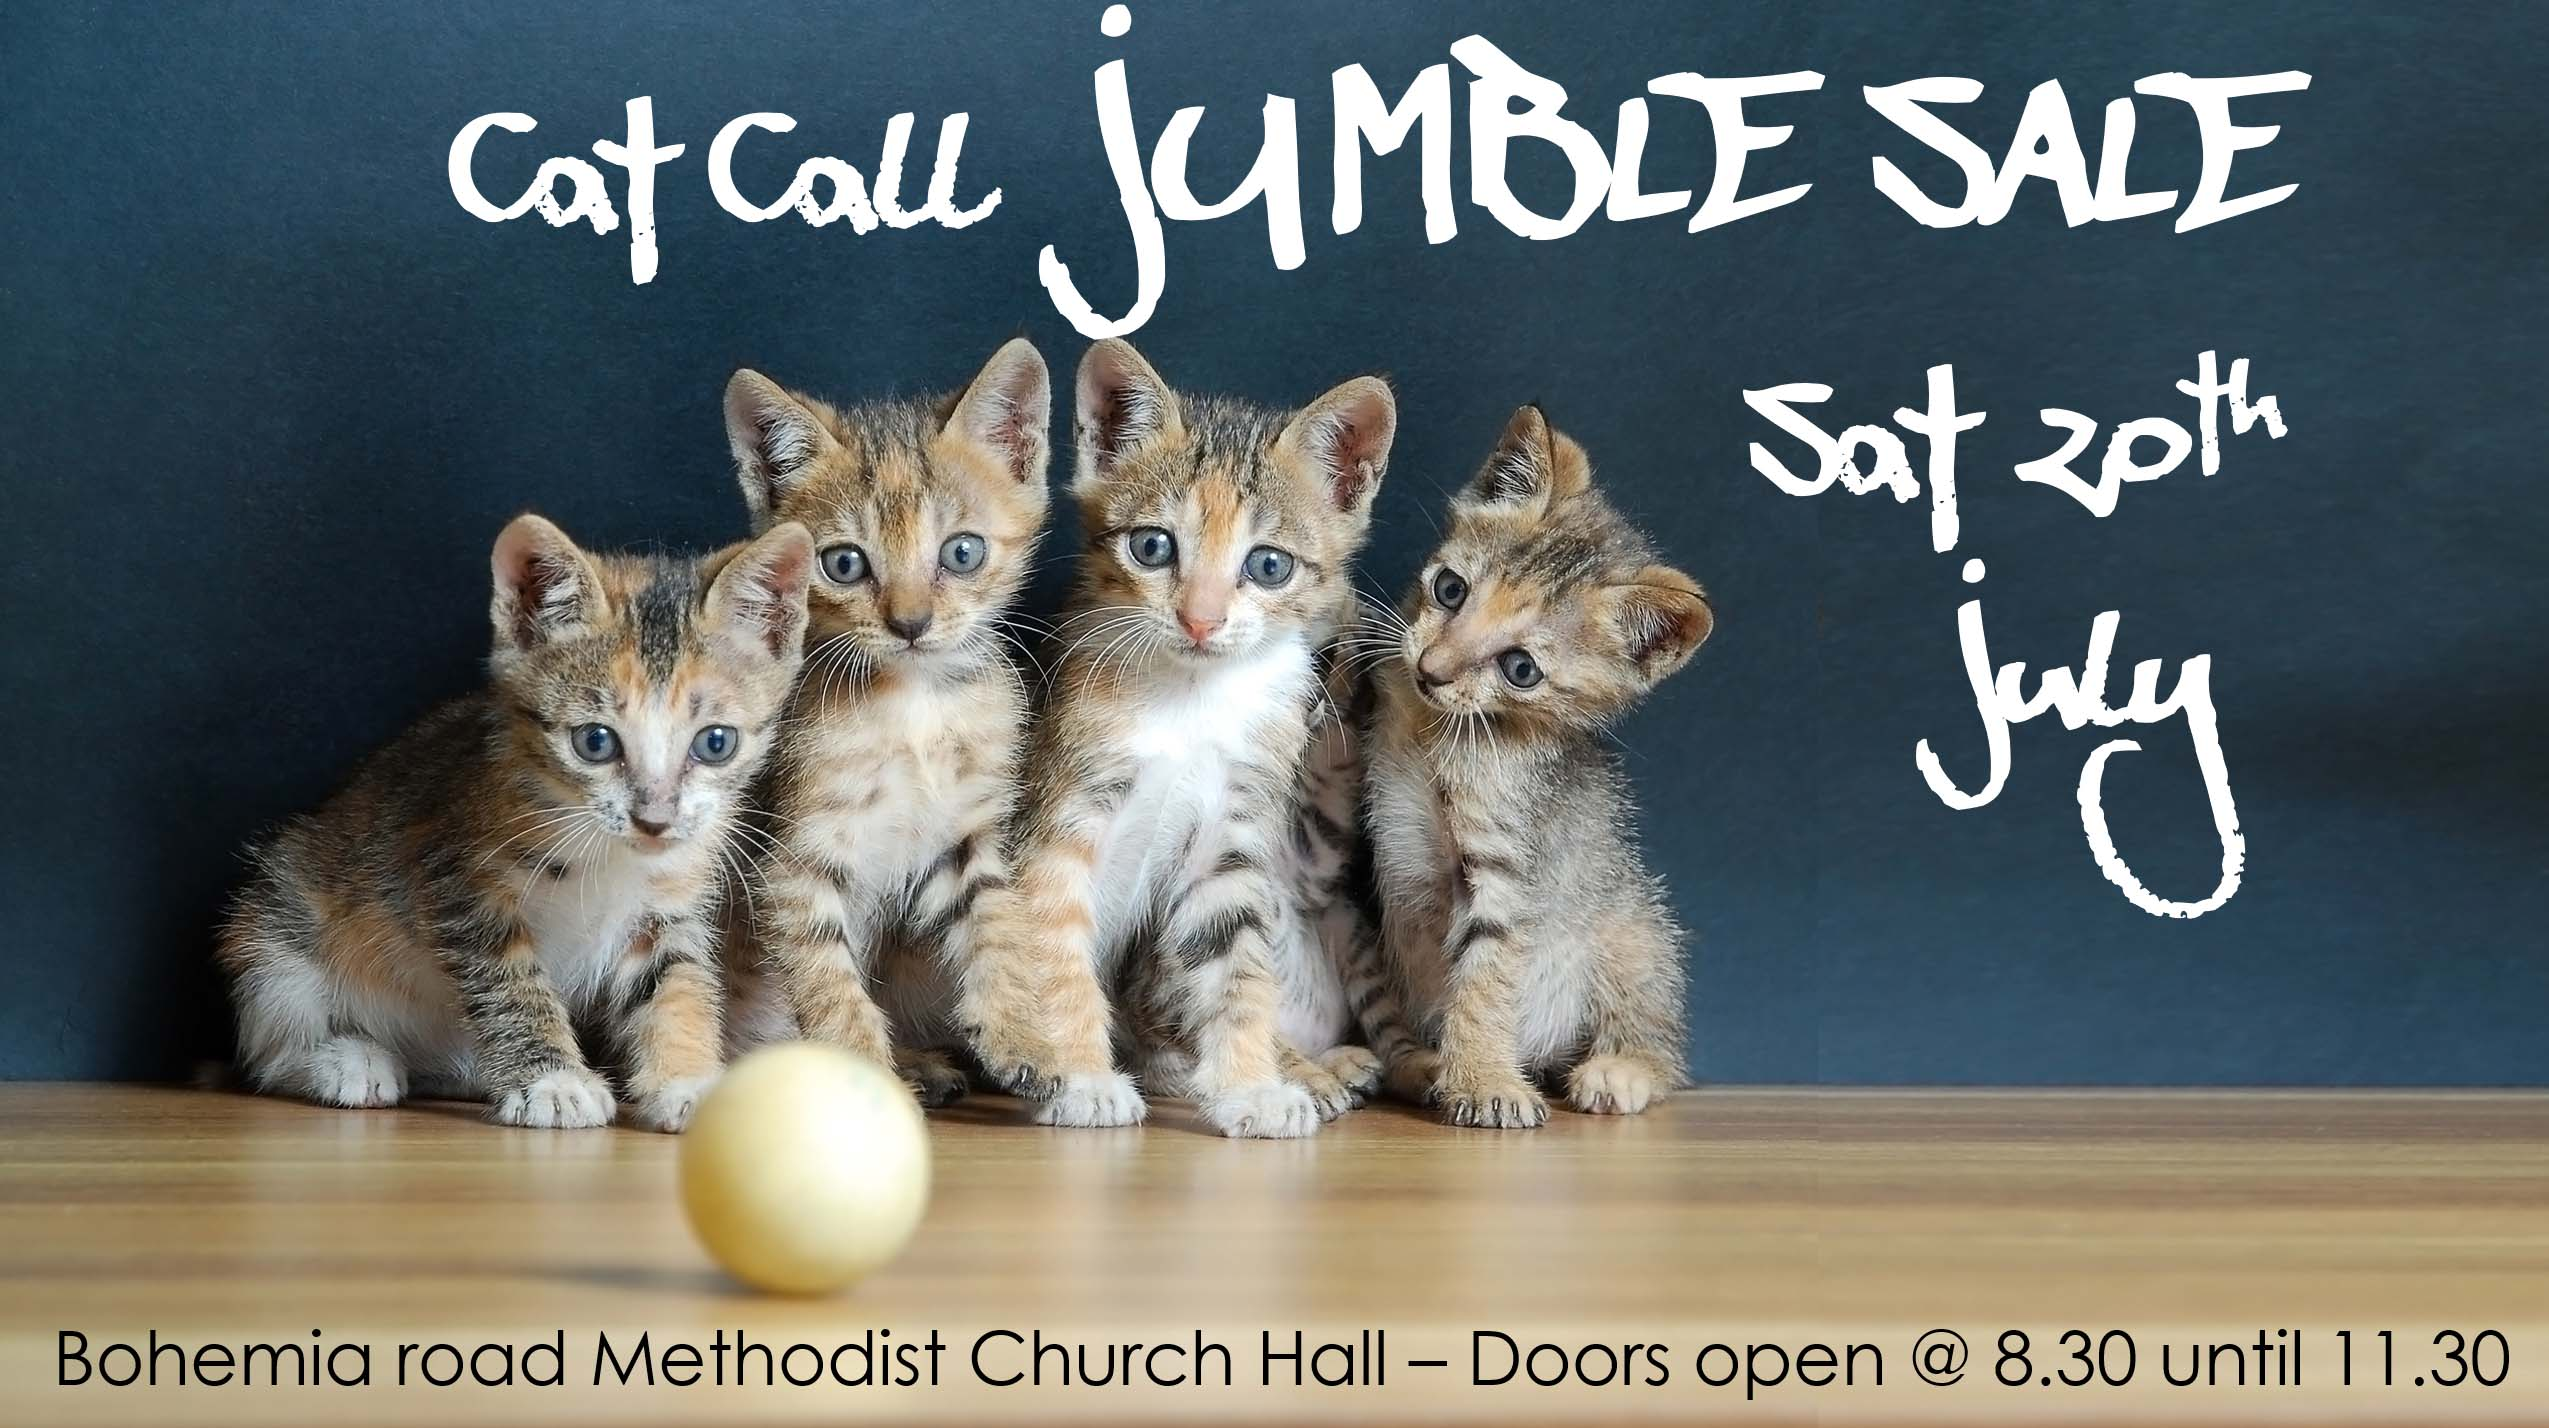 Cat Call Jumble Sale Sat 20th July